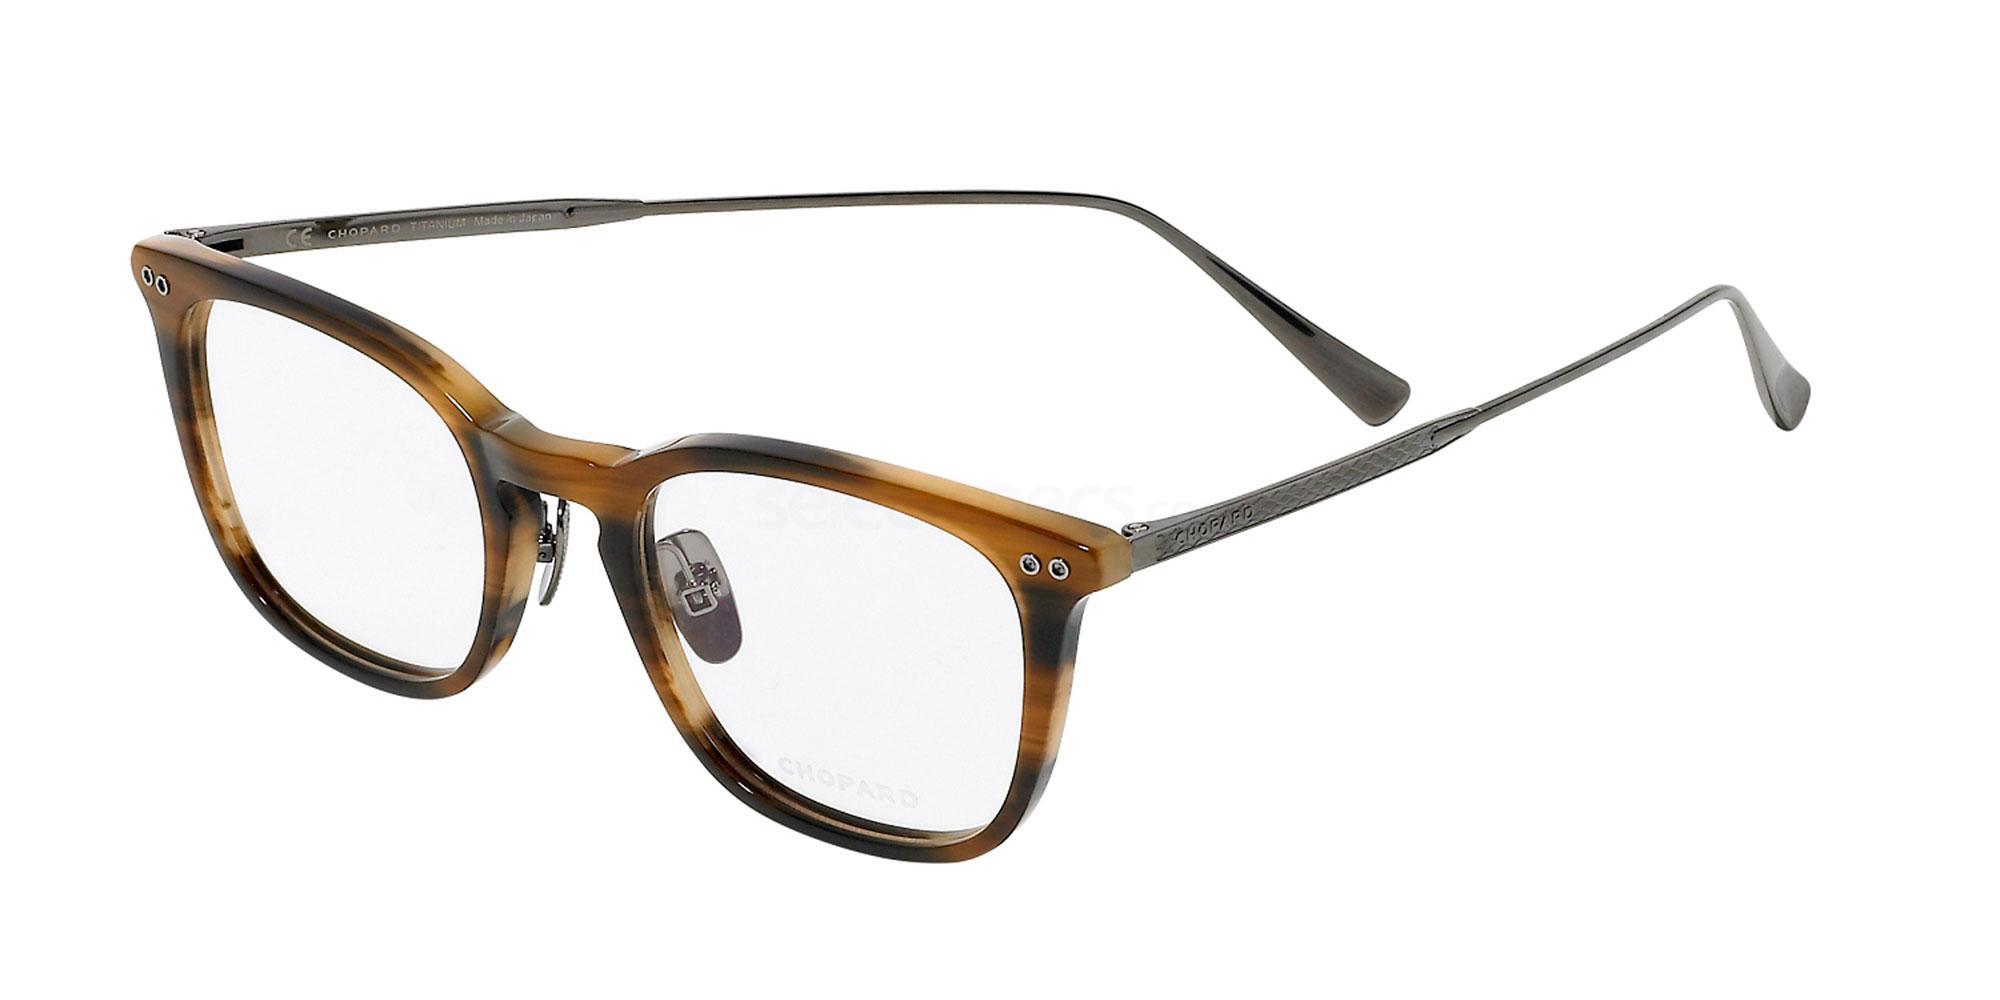 06XE VCH248M Glasses, Chopard